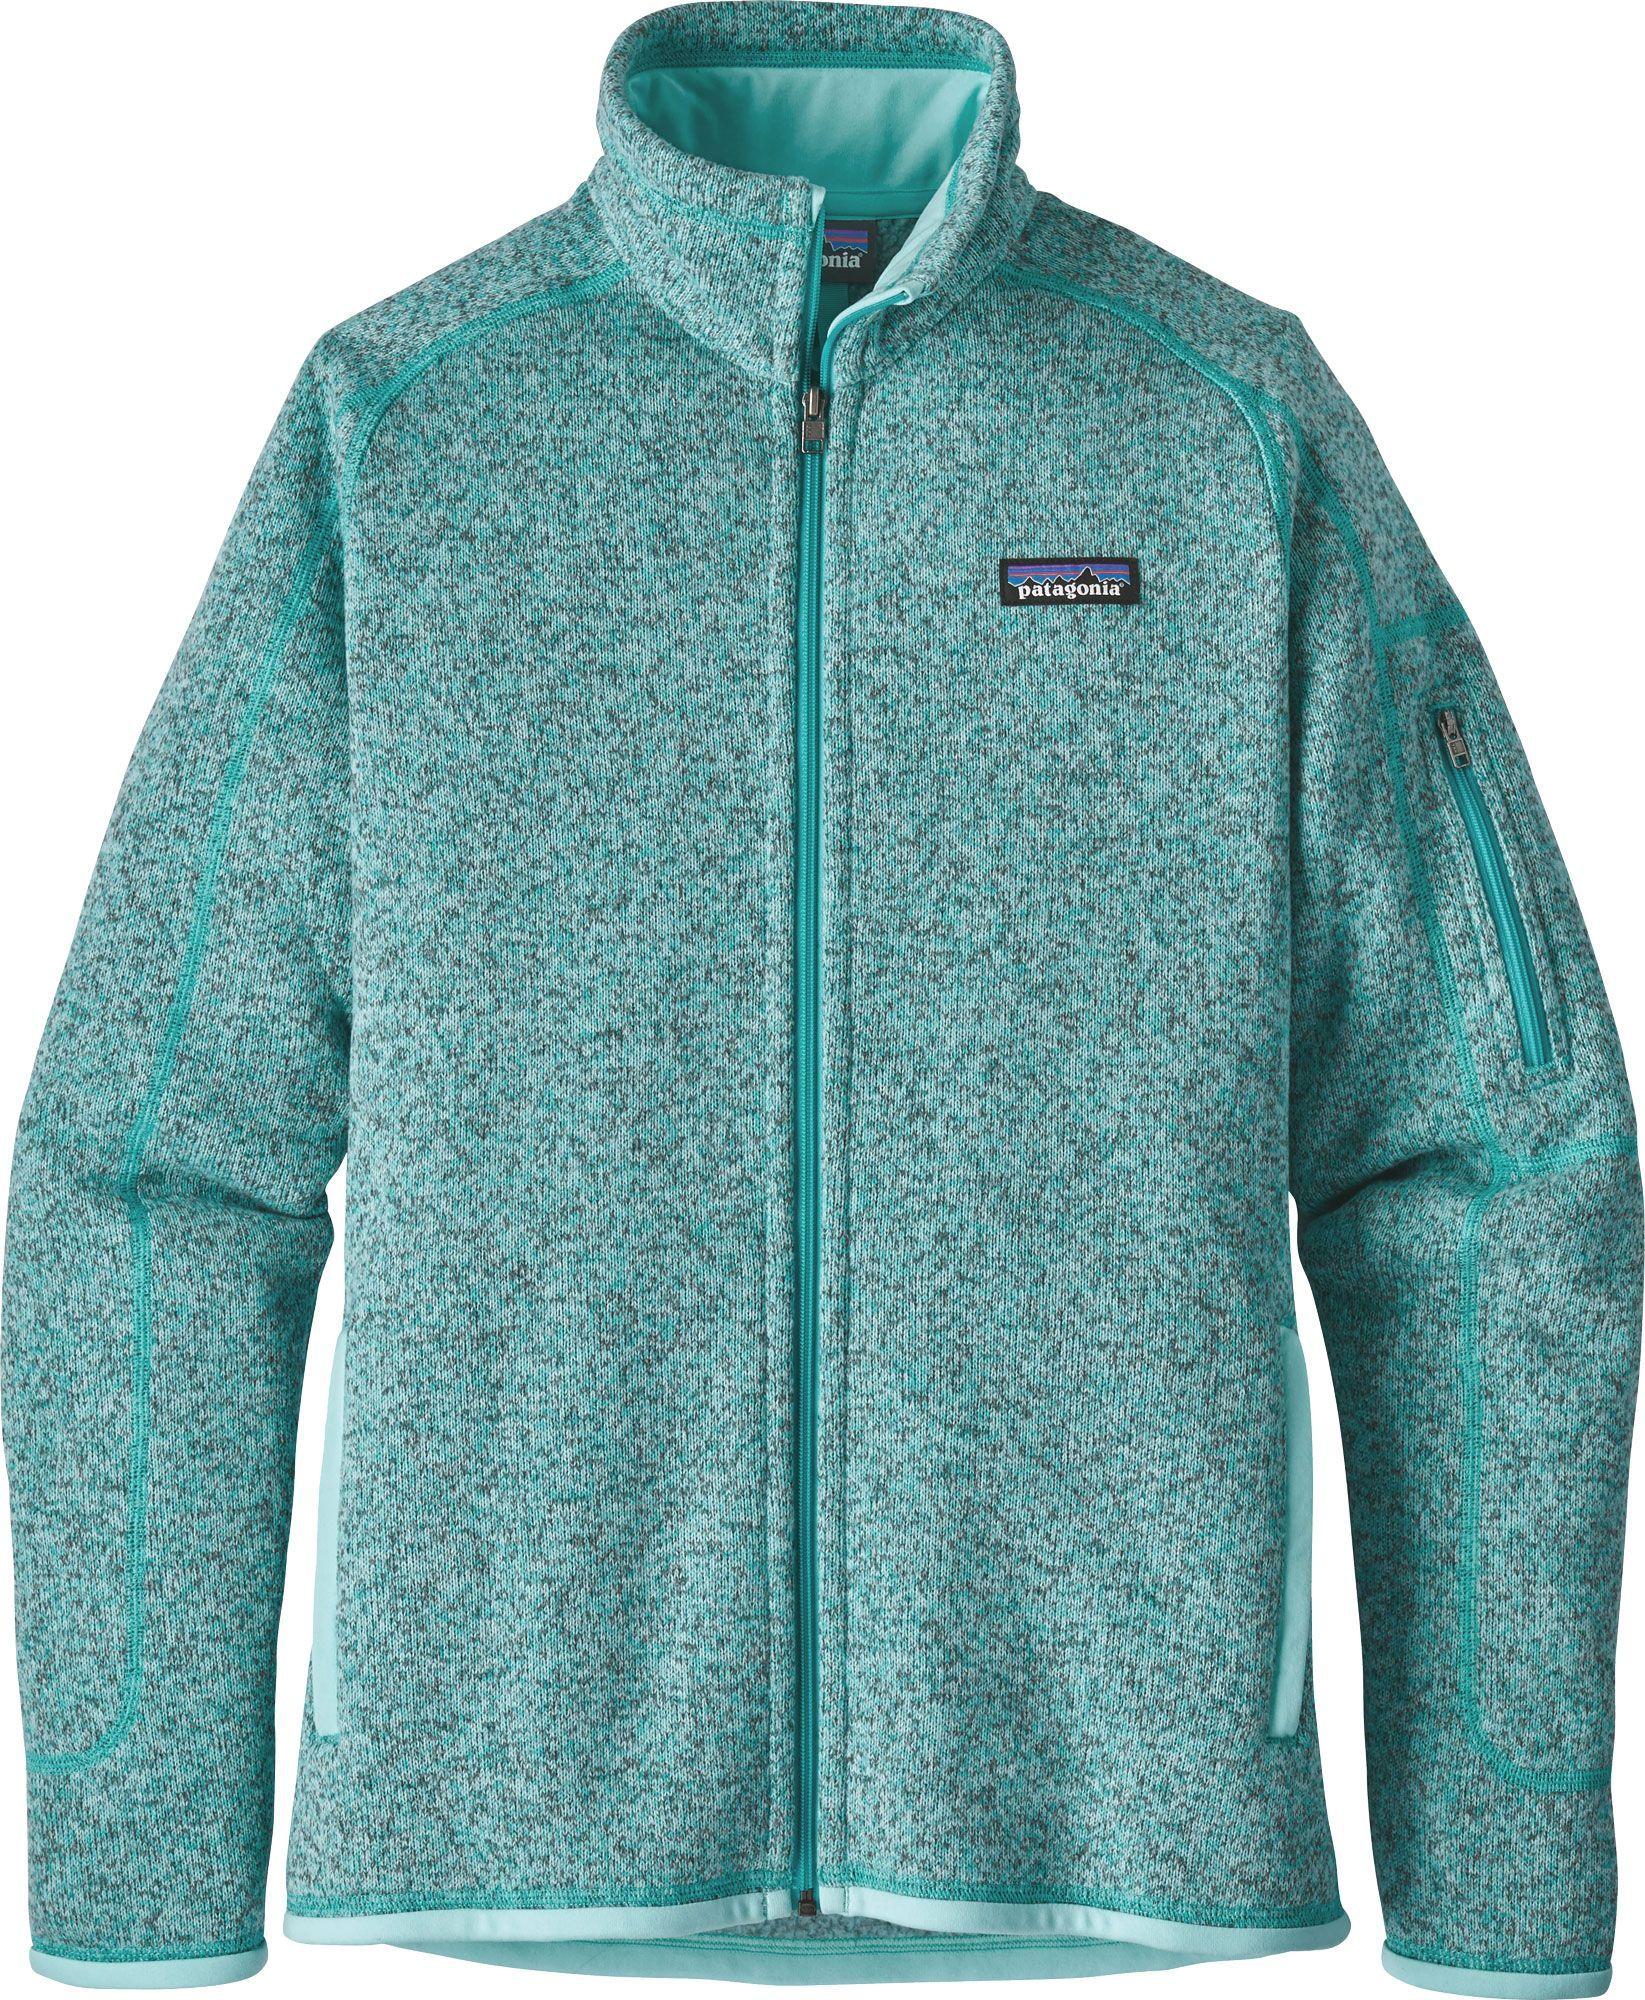 Patagonia Womens Better Sweater Fleece Jacket Size Xs Birch